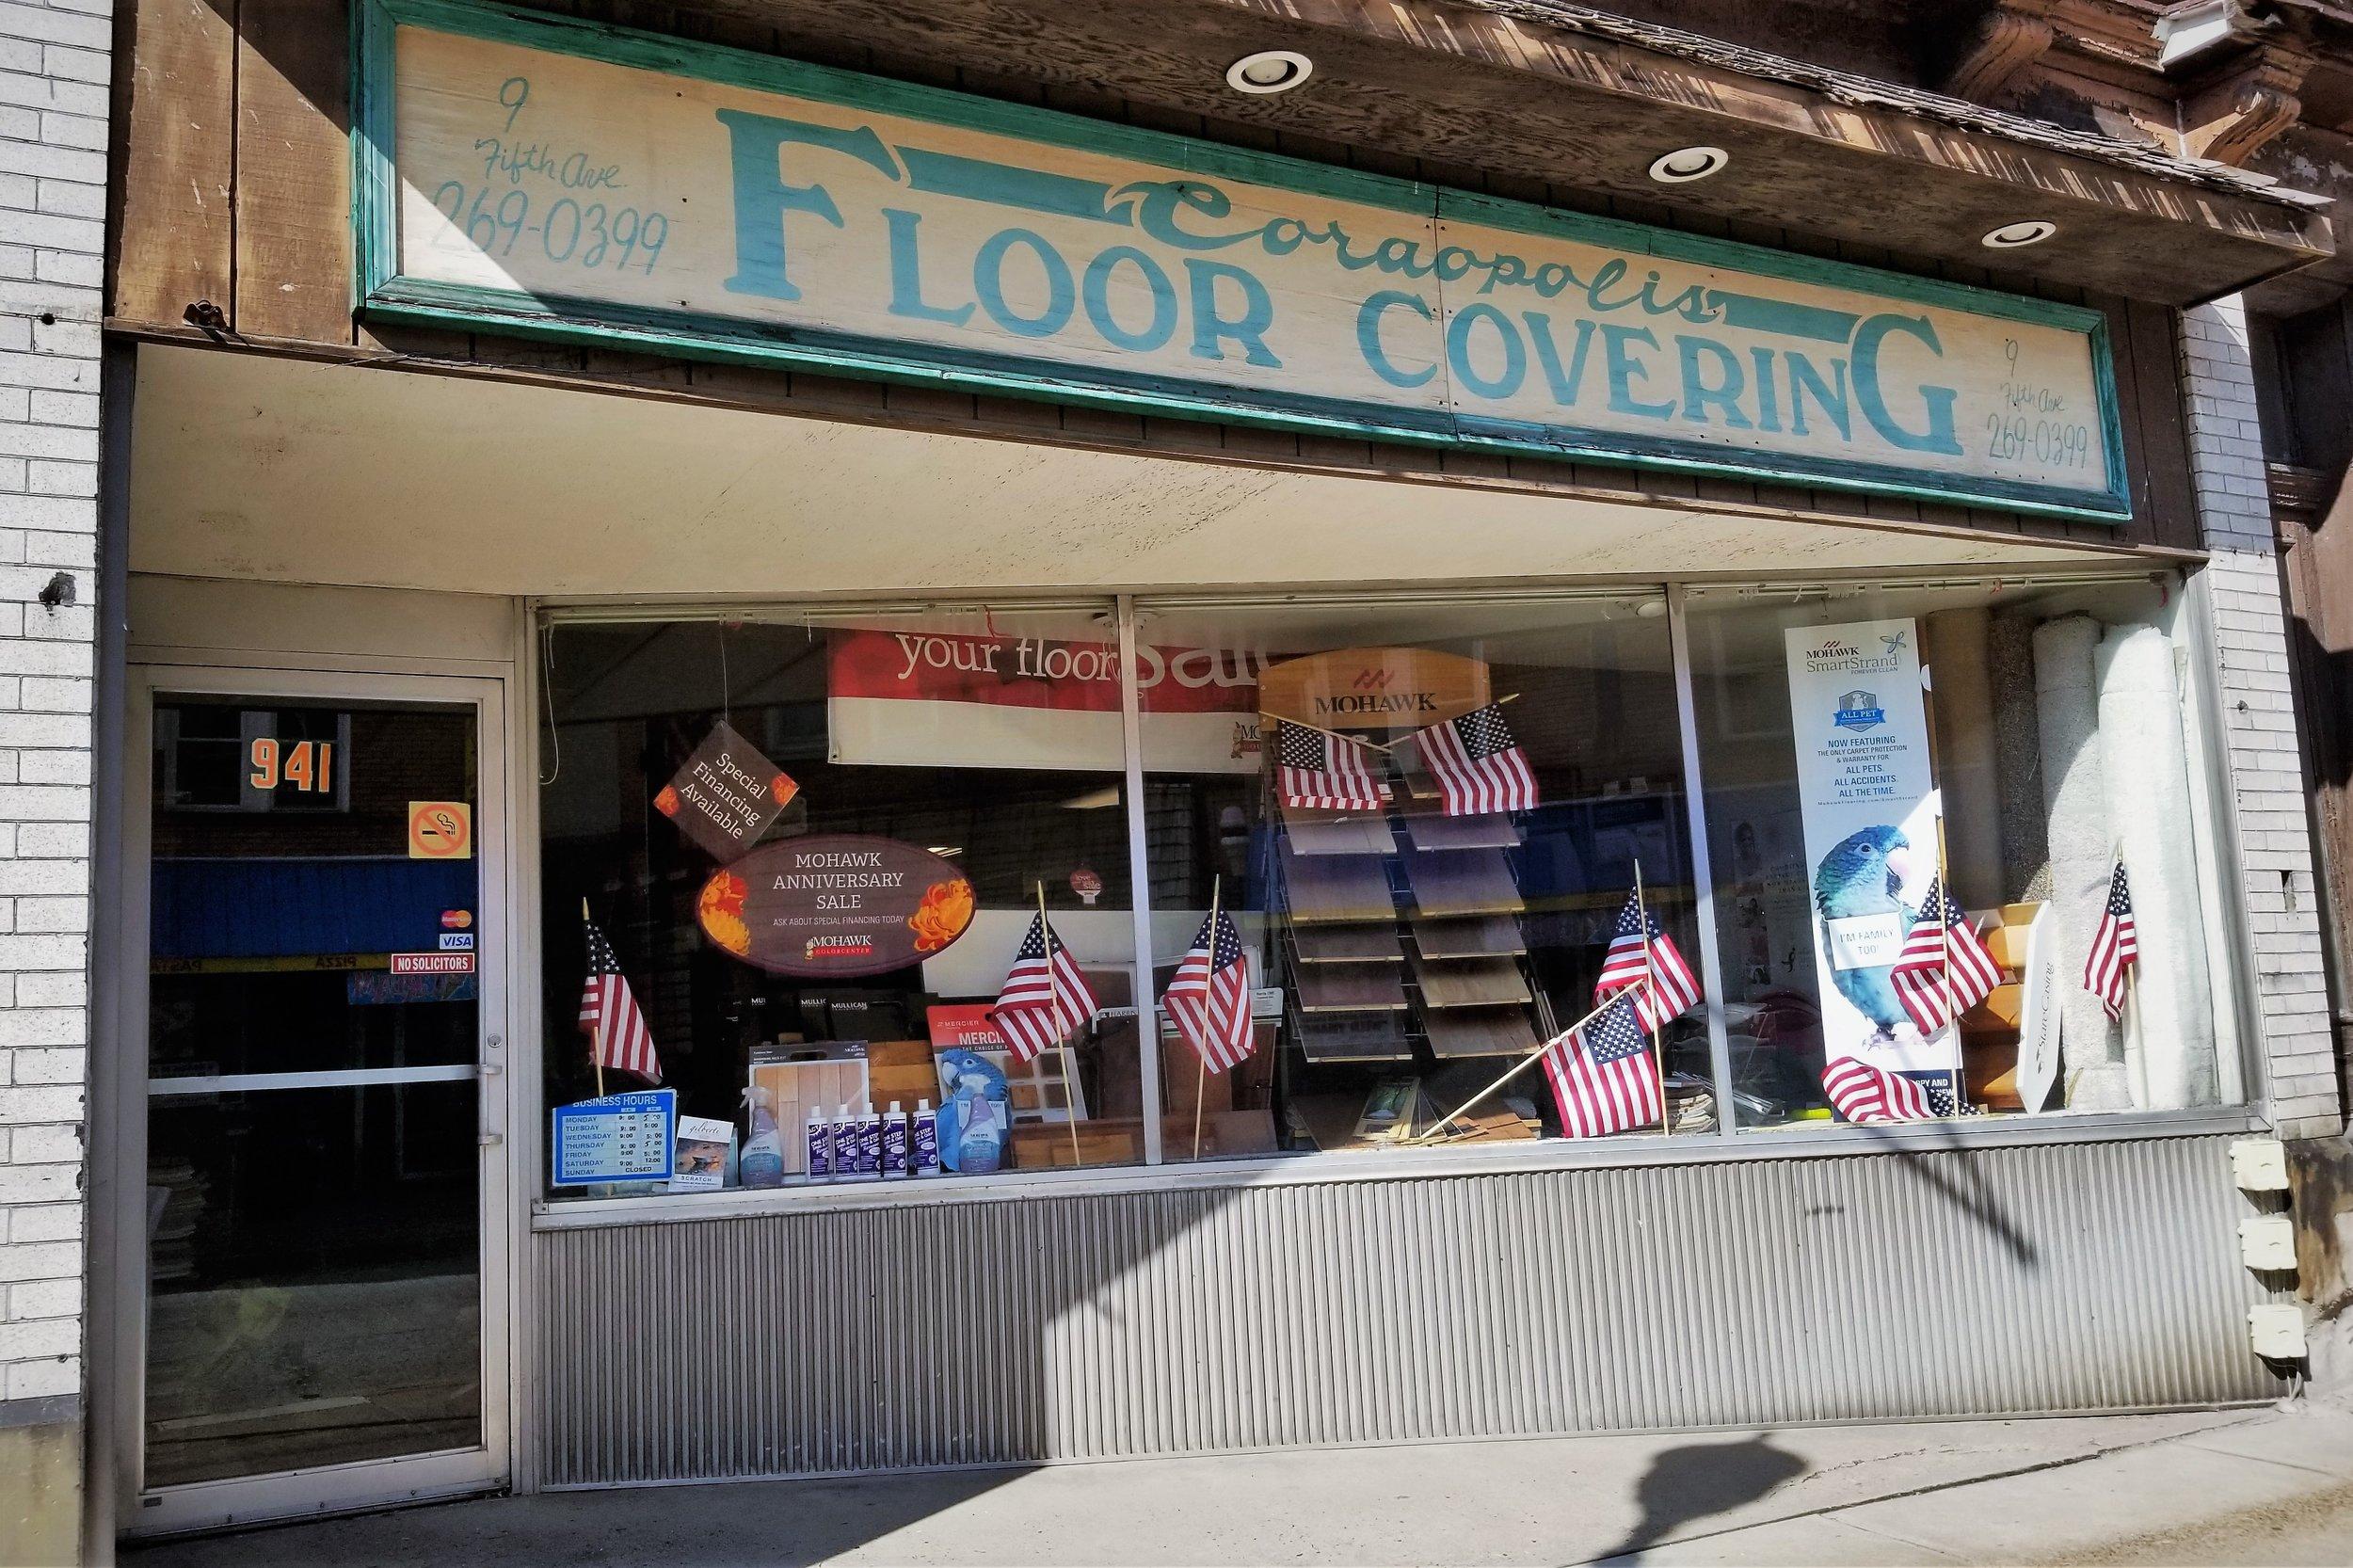 Coraopolis Floor Covering - 941 5th Ave,(412) 269-0399